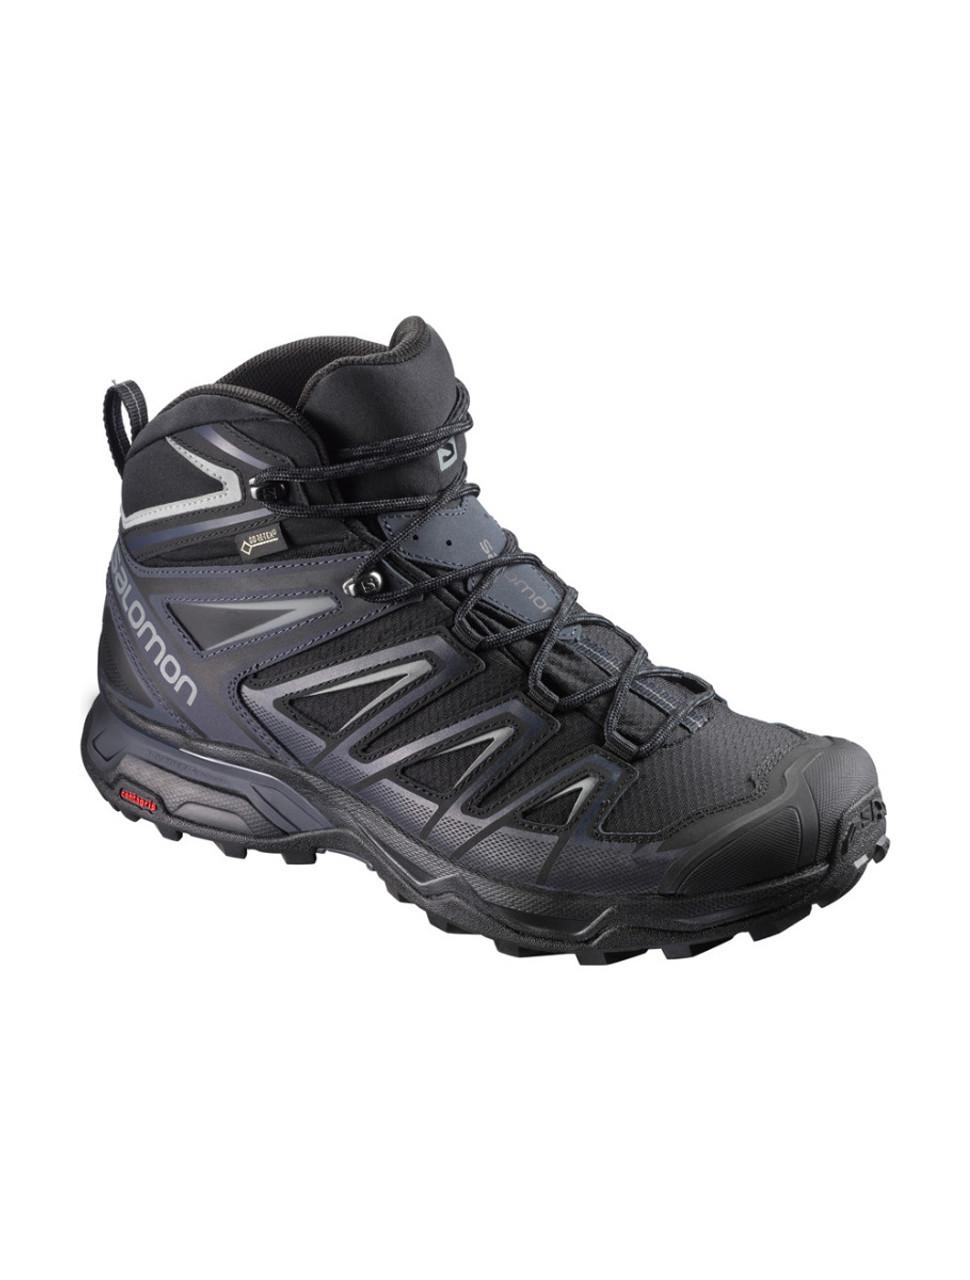 India Salomon Men X ULTRA 3 Yellow Hiking Shoes Size:(Uk